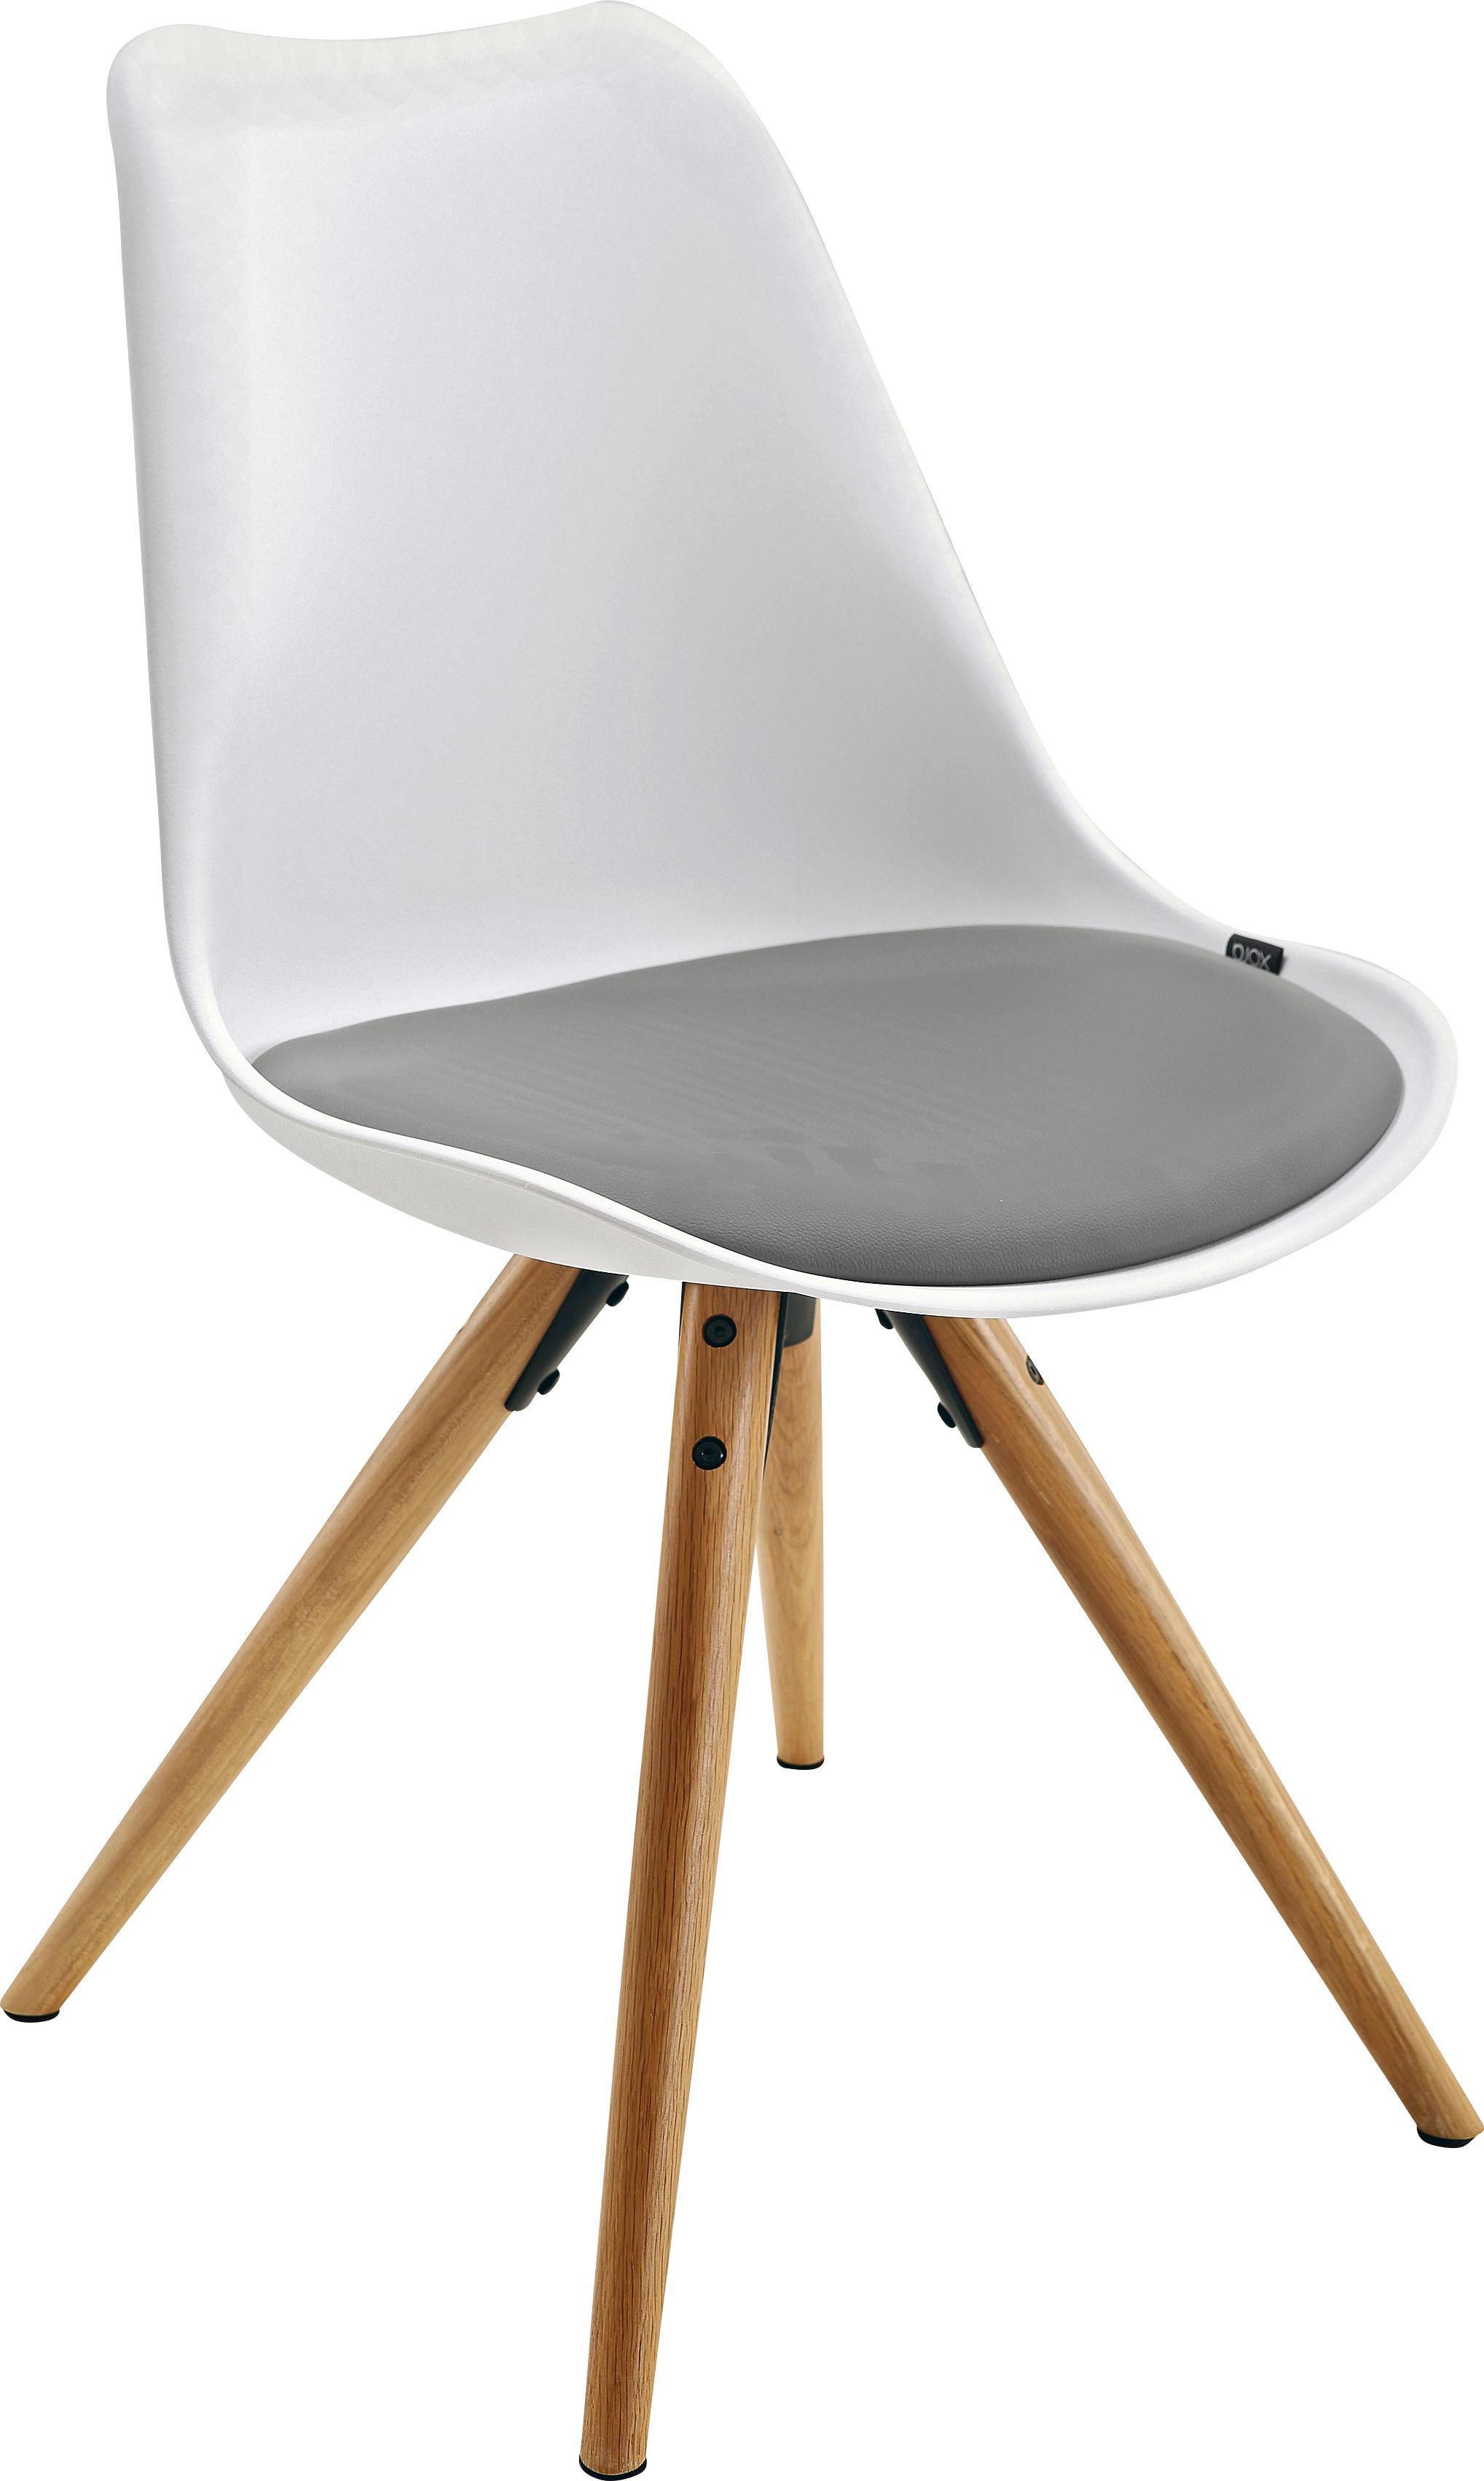 Good STUHL Lederlook Grau, Naturfarben, Weiß   Weiß/Naturfarben, LIFESTYLE, Holz/ Nice Design